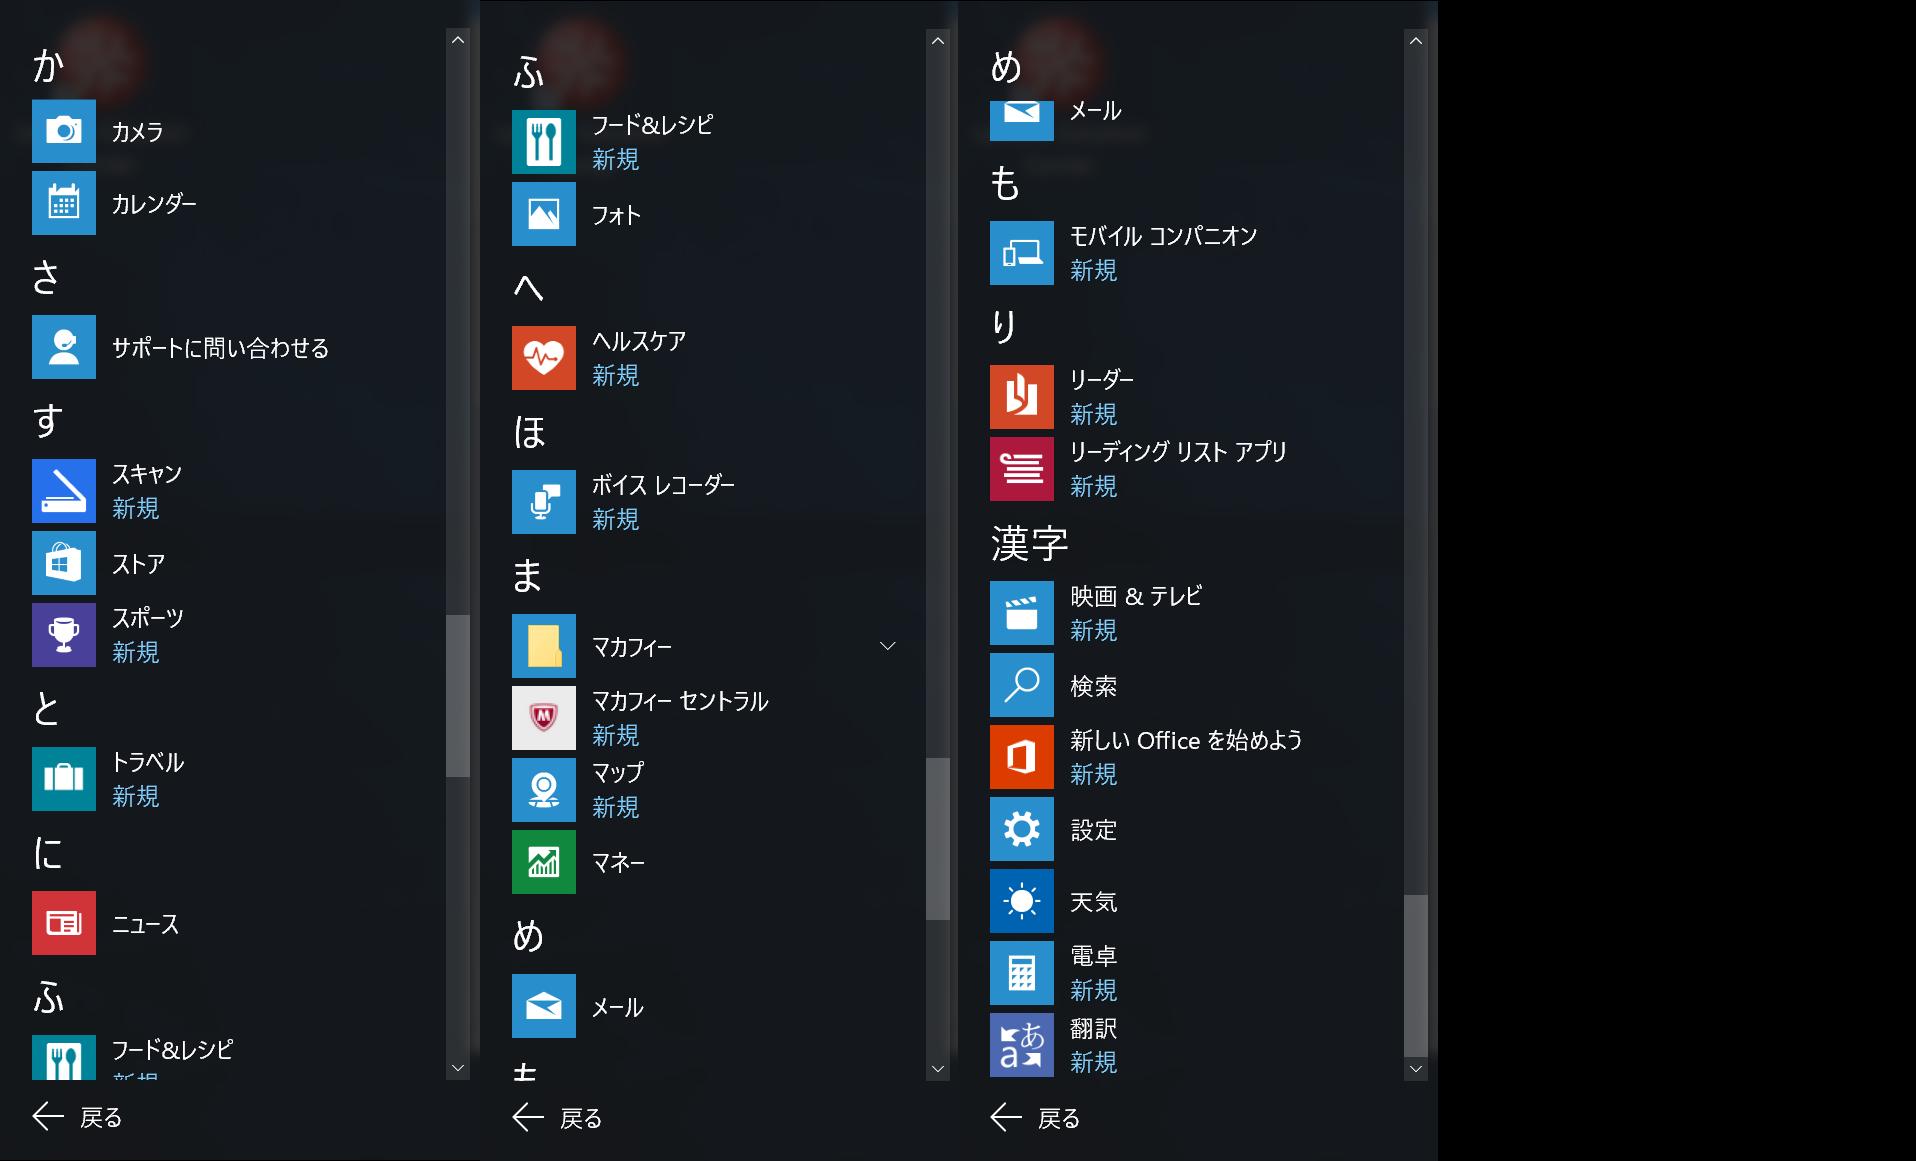 Windows 10 アプリ一覧(2/2)